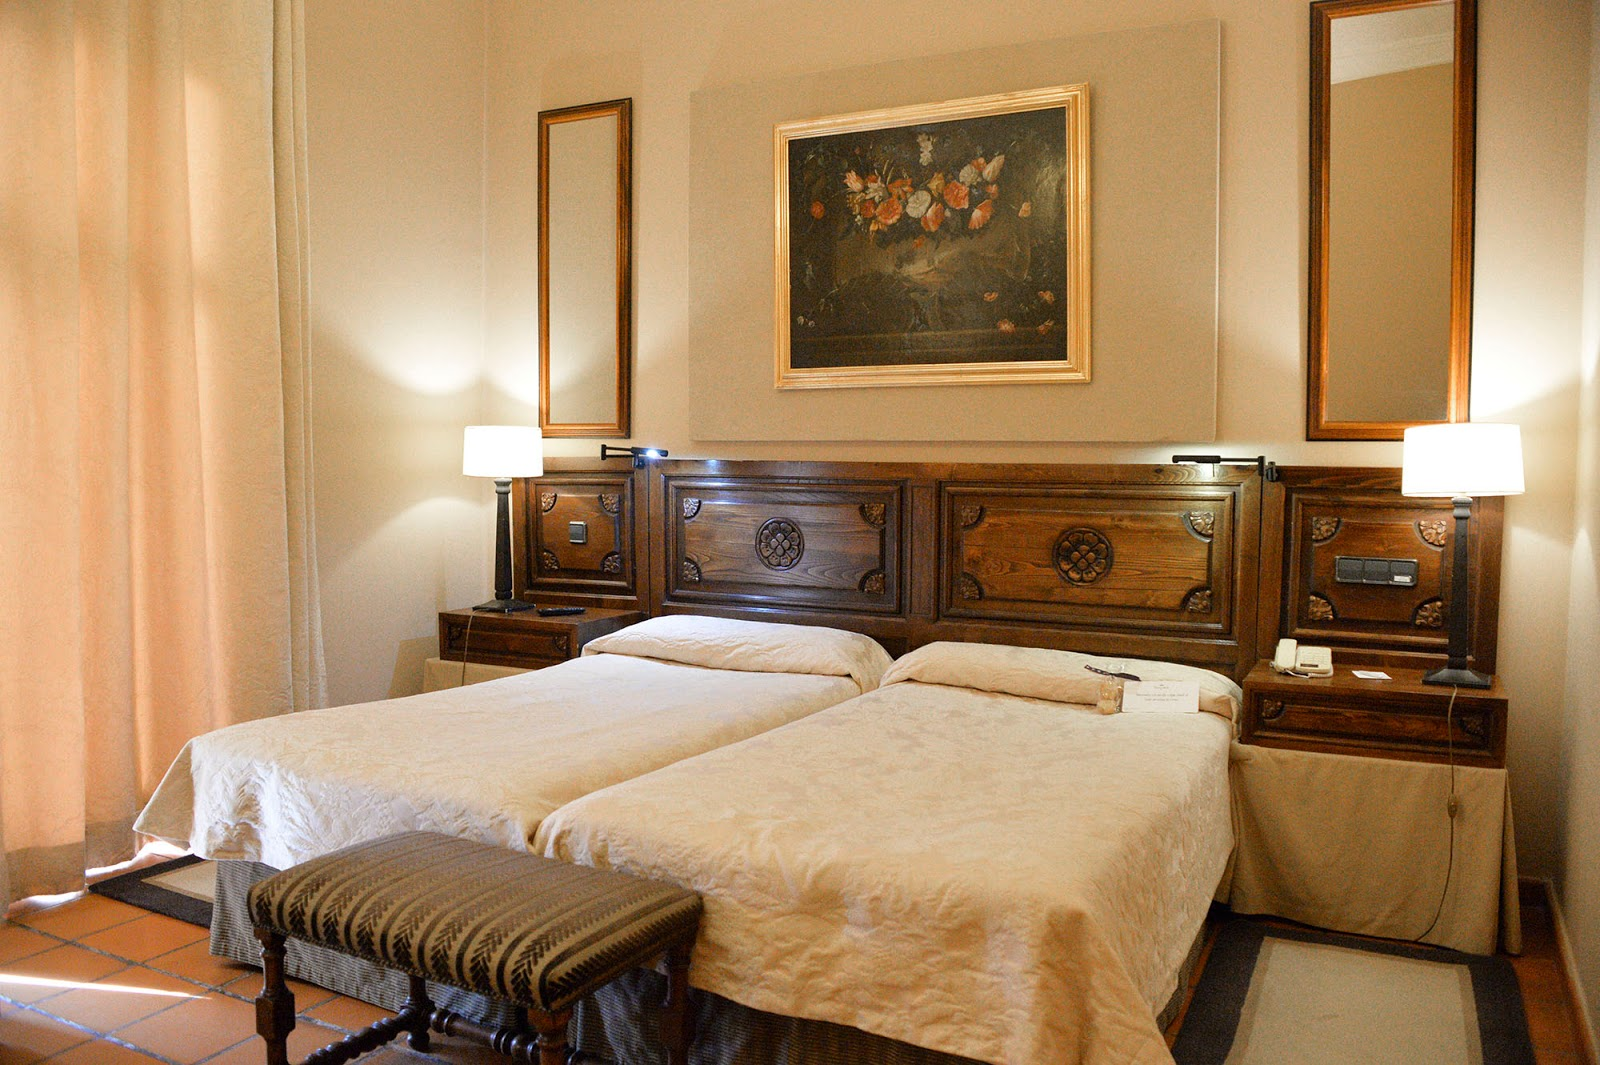 lerma burgos spain castile leon parador hotel room ducal palace beautiful village